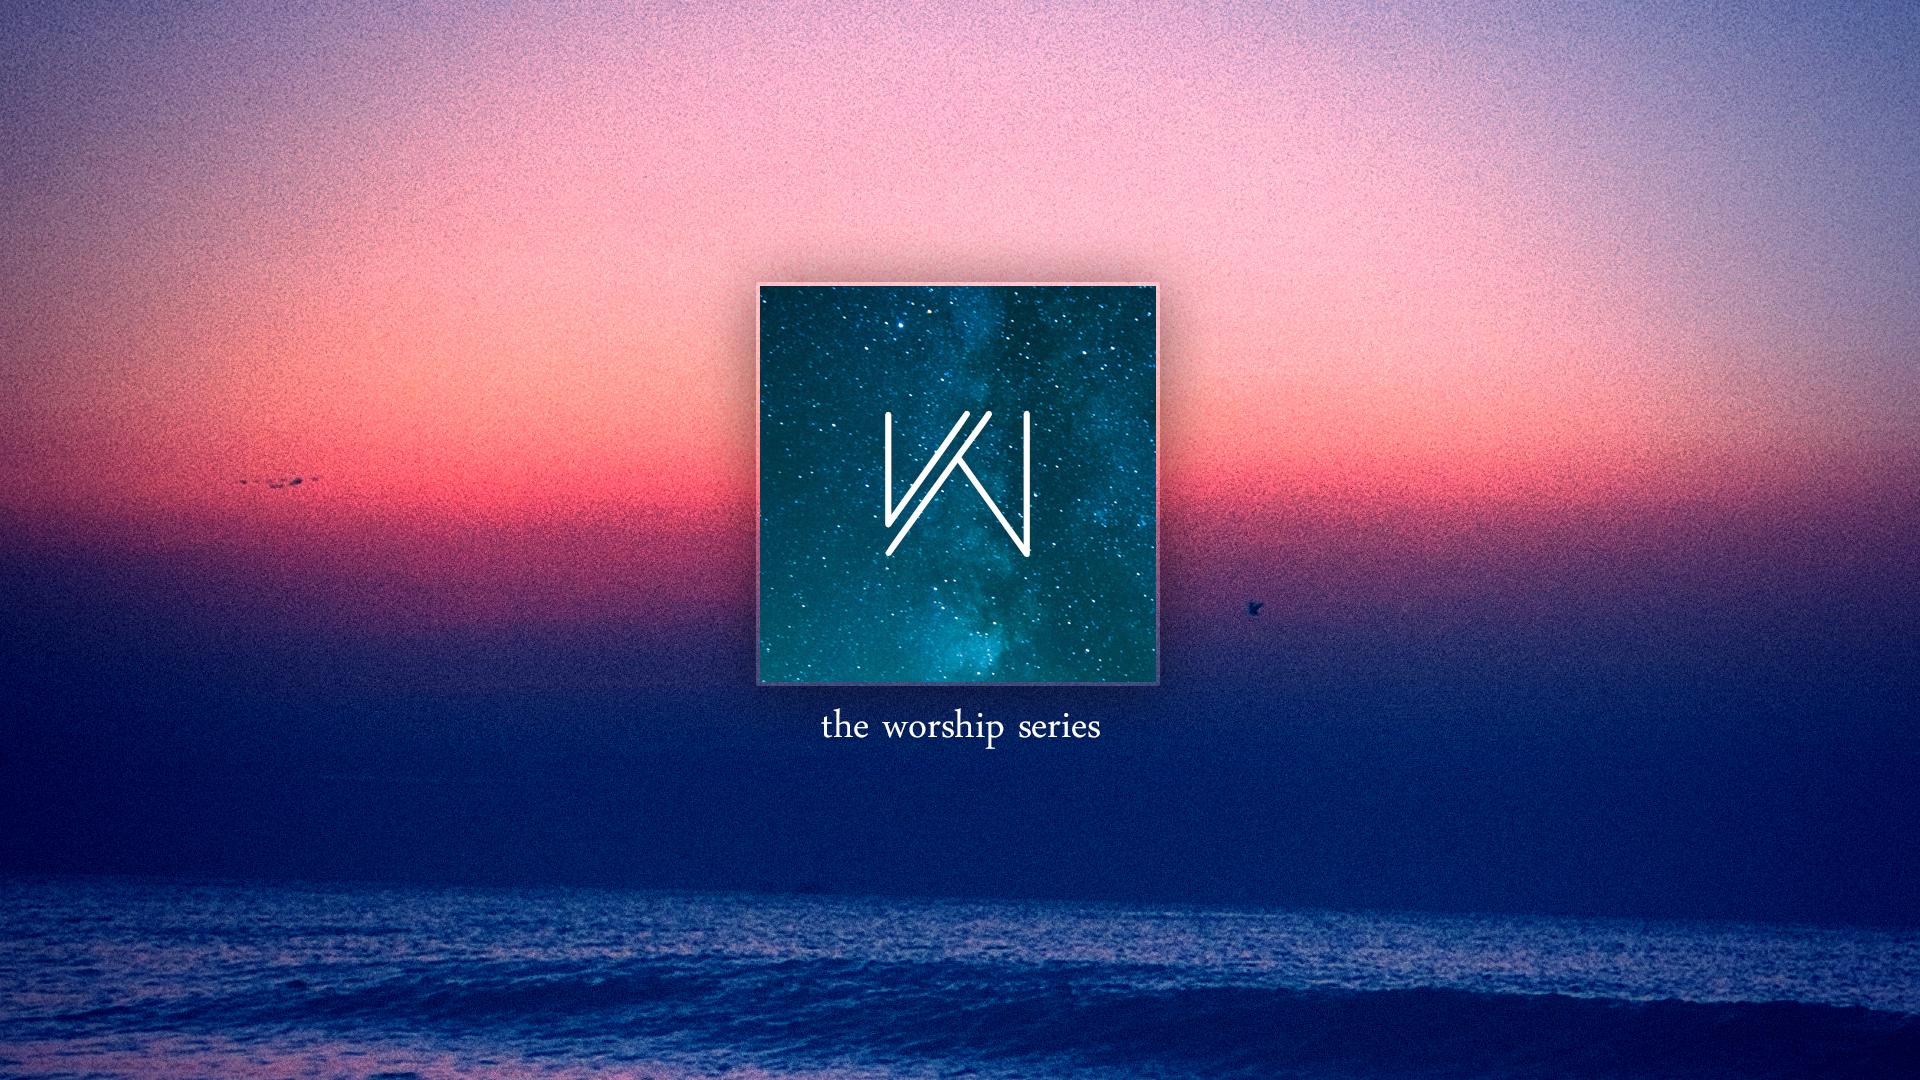 The Worship Series